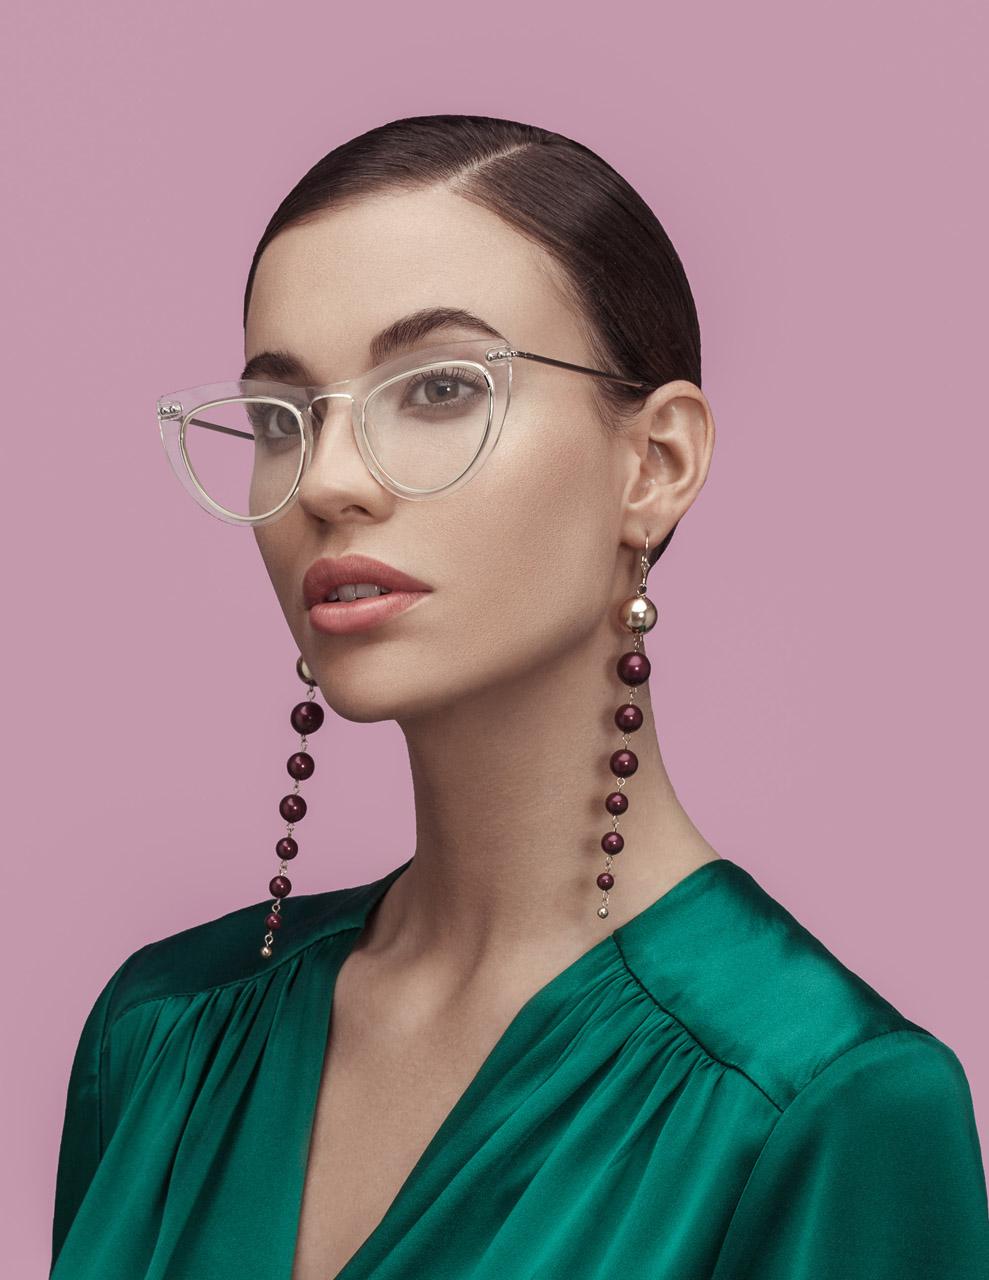 Nadia-Duca-Makeup-Artist-commercial (22).jpg